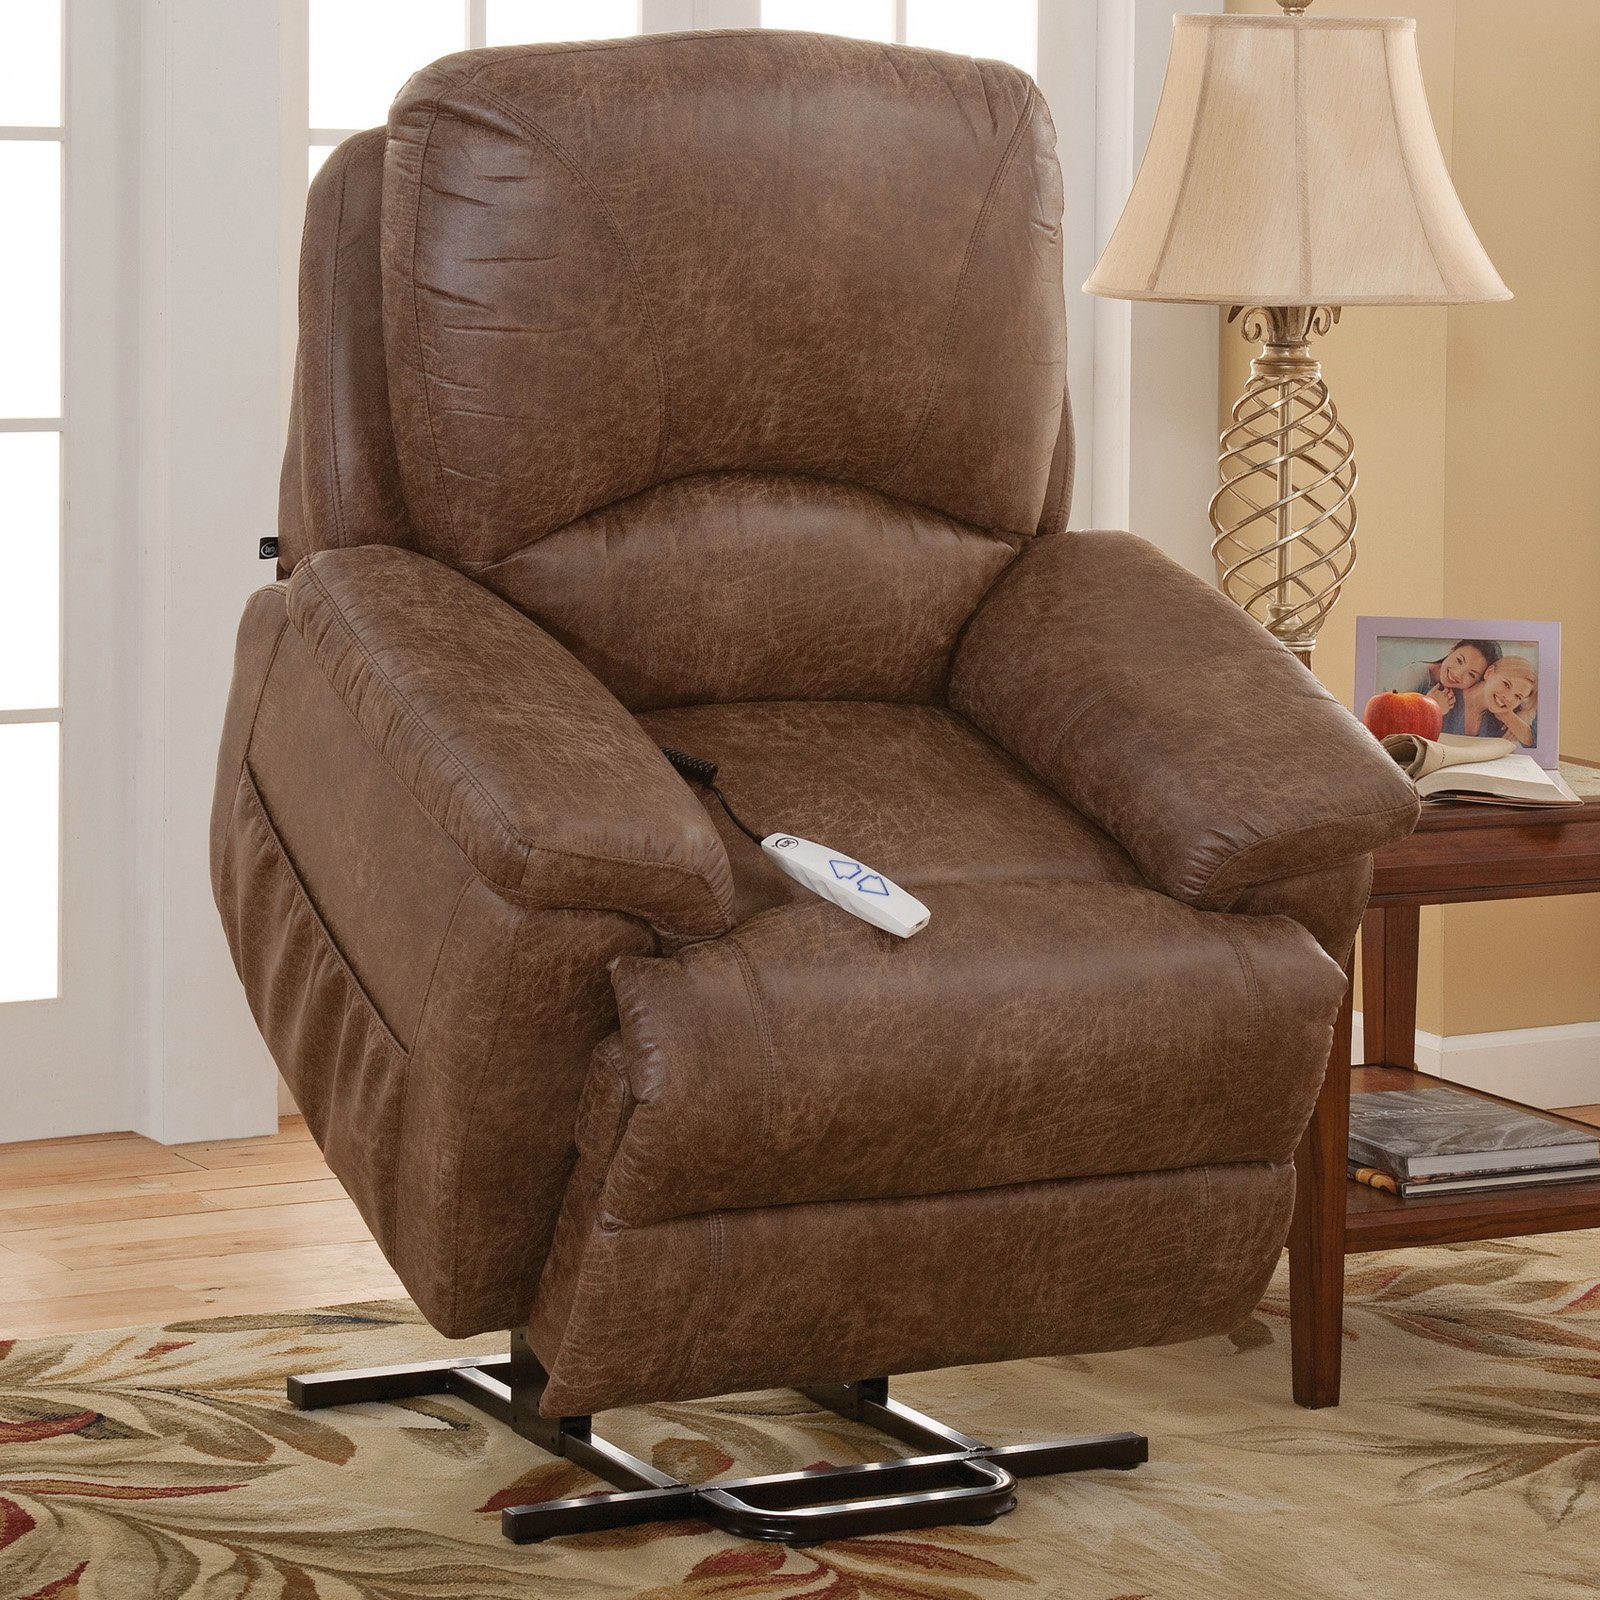 n brown chairs furniture depot ds recliner swivel fabric room hill coffee recliners living pri lift chair power b birch the serta home